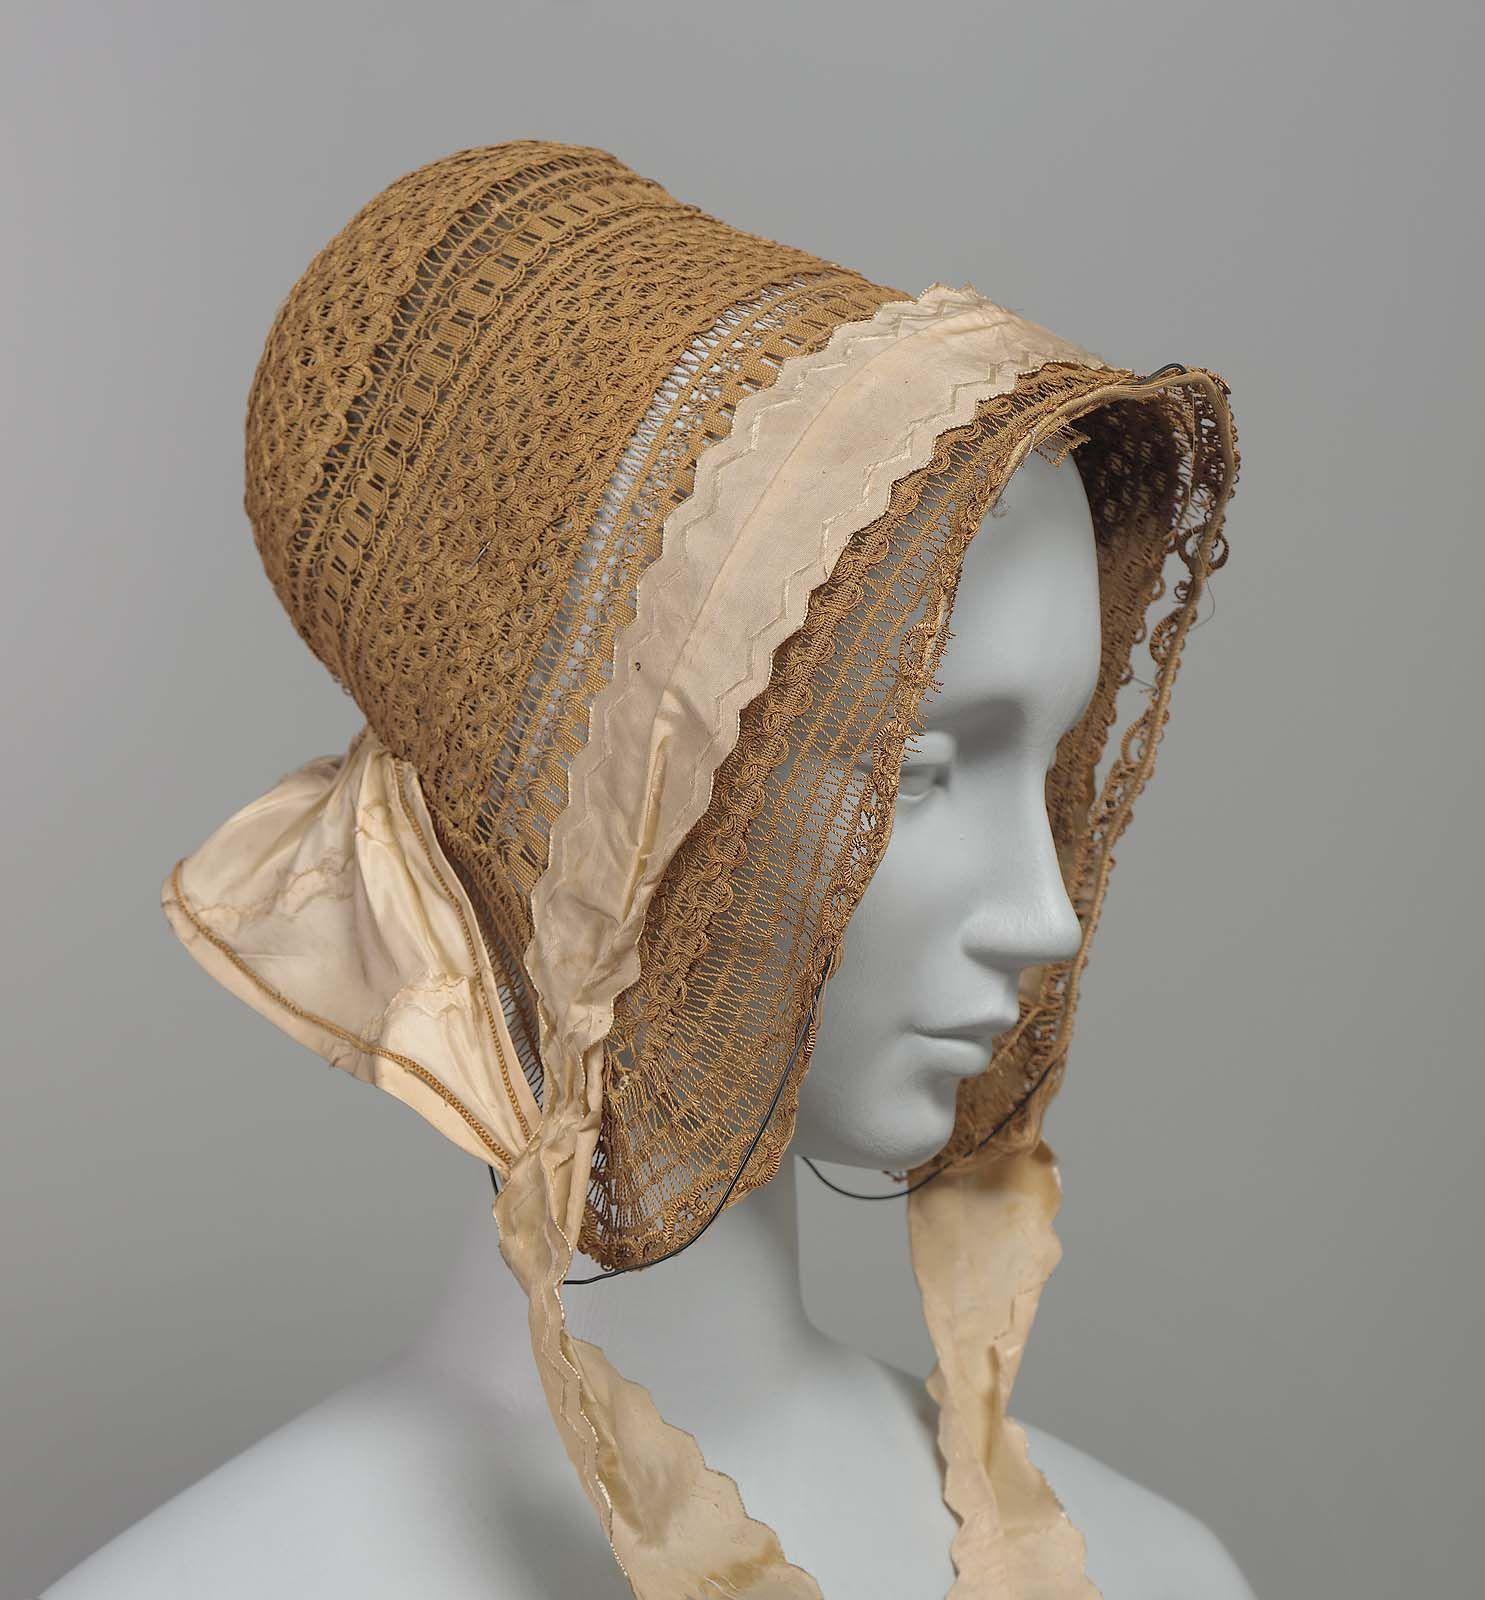 Straw bonnet, American (?), Ca 1840s. Museum of Fine Arts, nr. 44.208